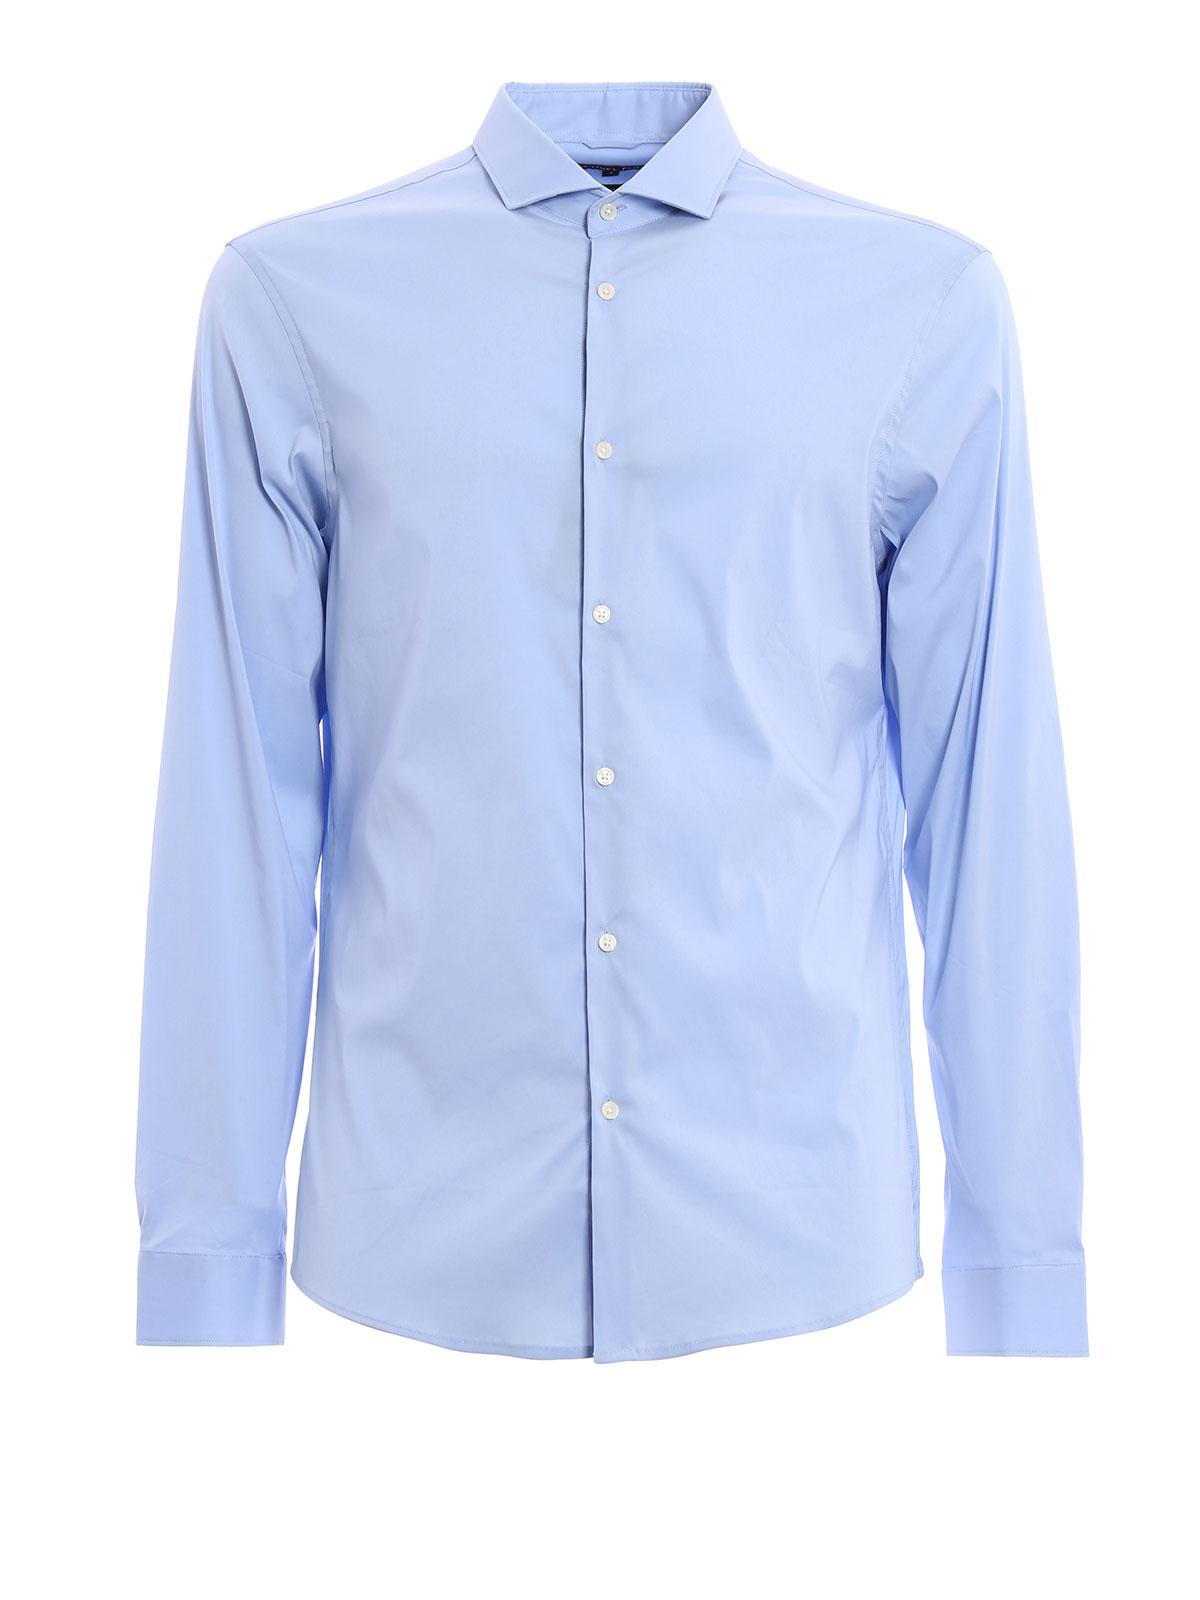 Stretch cotton slim fit shirt by michael kors shirts ikrix for Slim fit cotton shirts